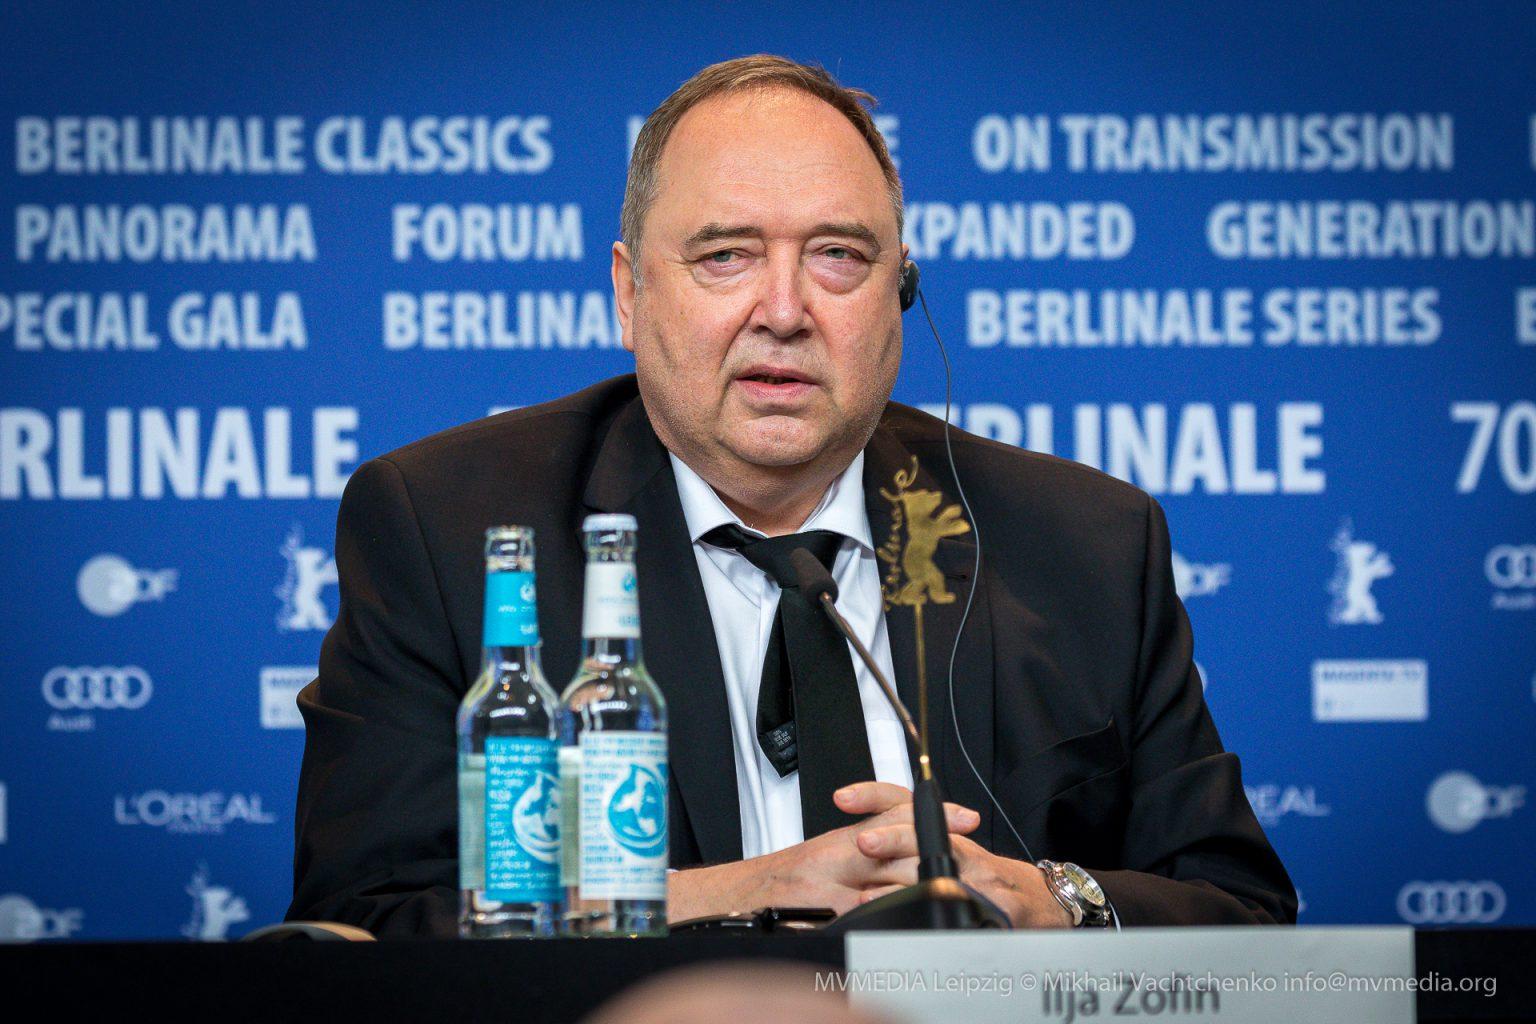 Ilja Zofin Pressekonferenz Berlinale Persian Lessons